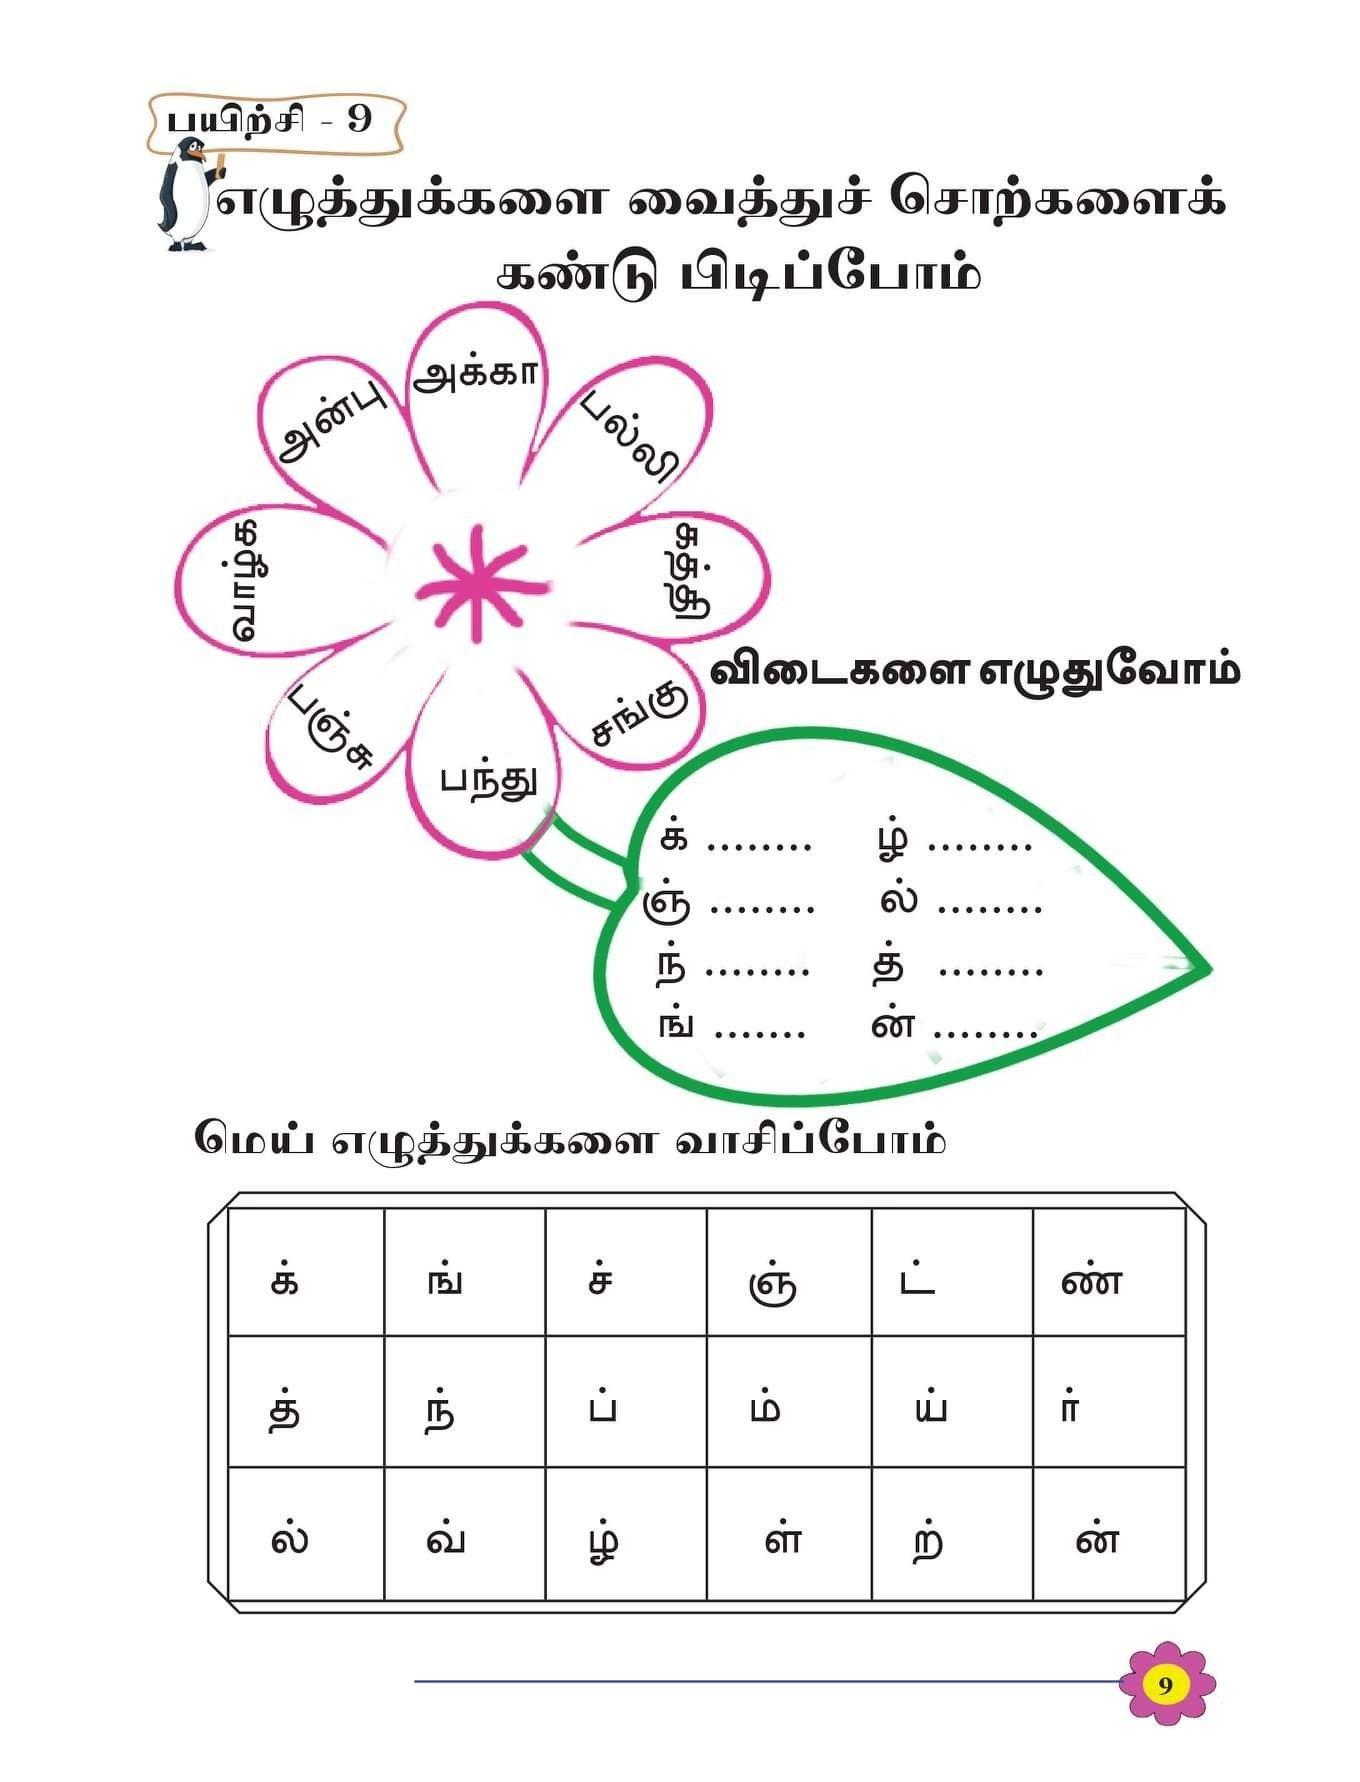 Language Worksheets Image By Kasthury Kas On